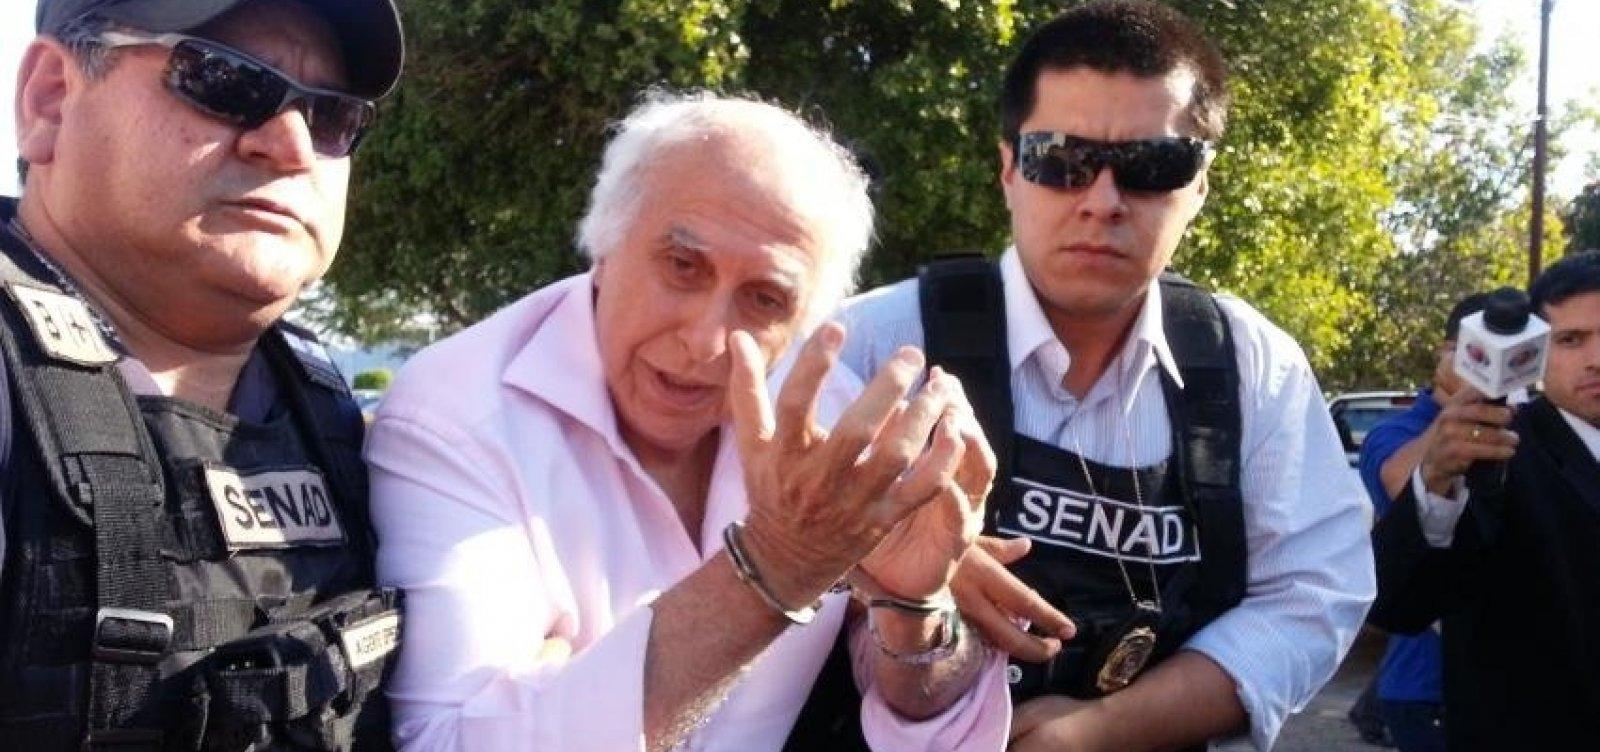 Justiça determina que Roger Abdelmassih retorne a presídio